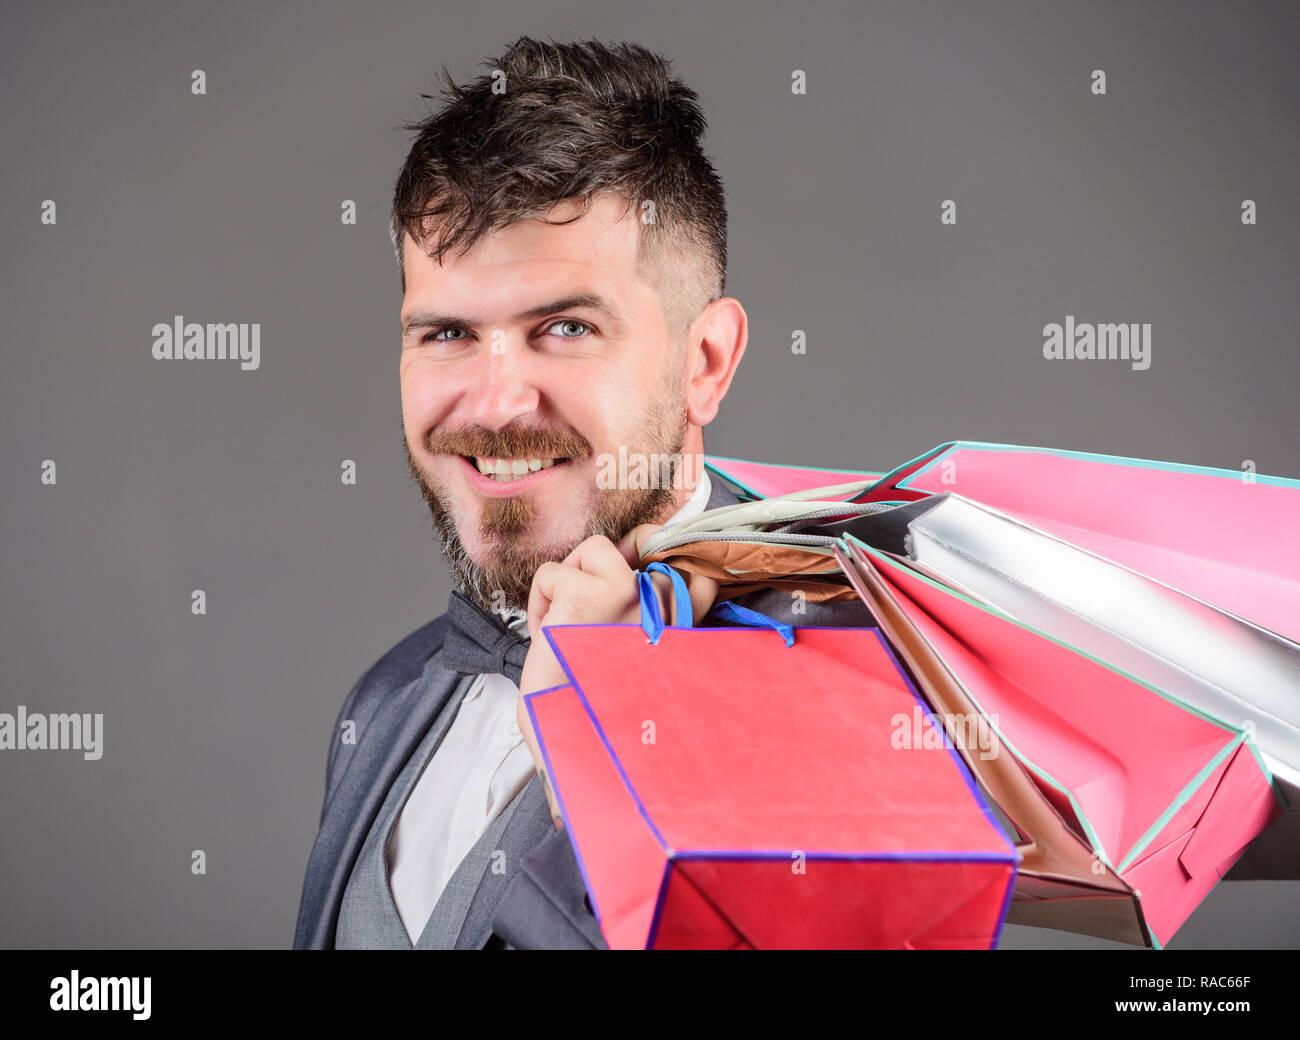 Man bearded elegant businessman carry shopping bags on grey background. Make shopping more joyful. Elite boutique. Enjoy shopping profitable deals black friday. Shopping with discount enjoy purchase. - Stock Image